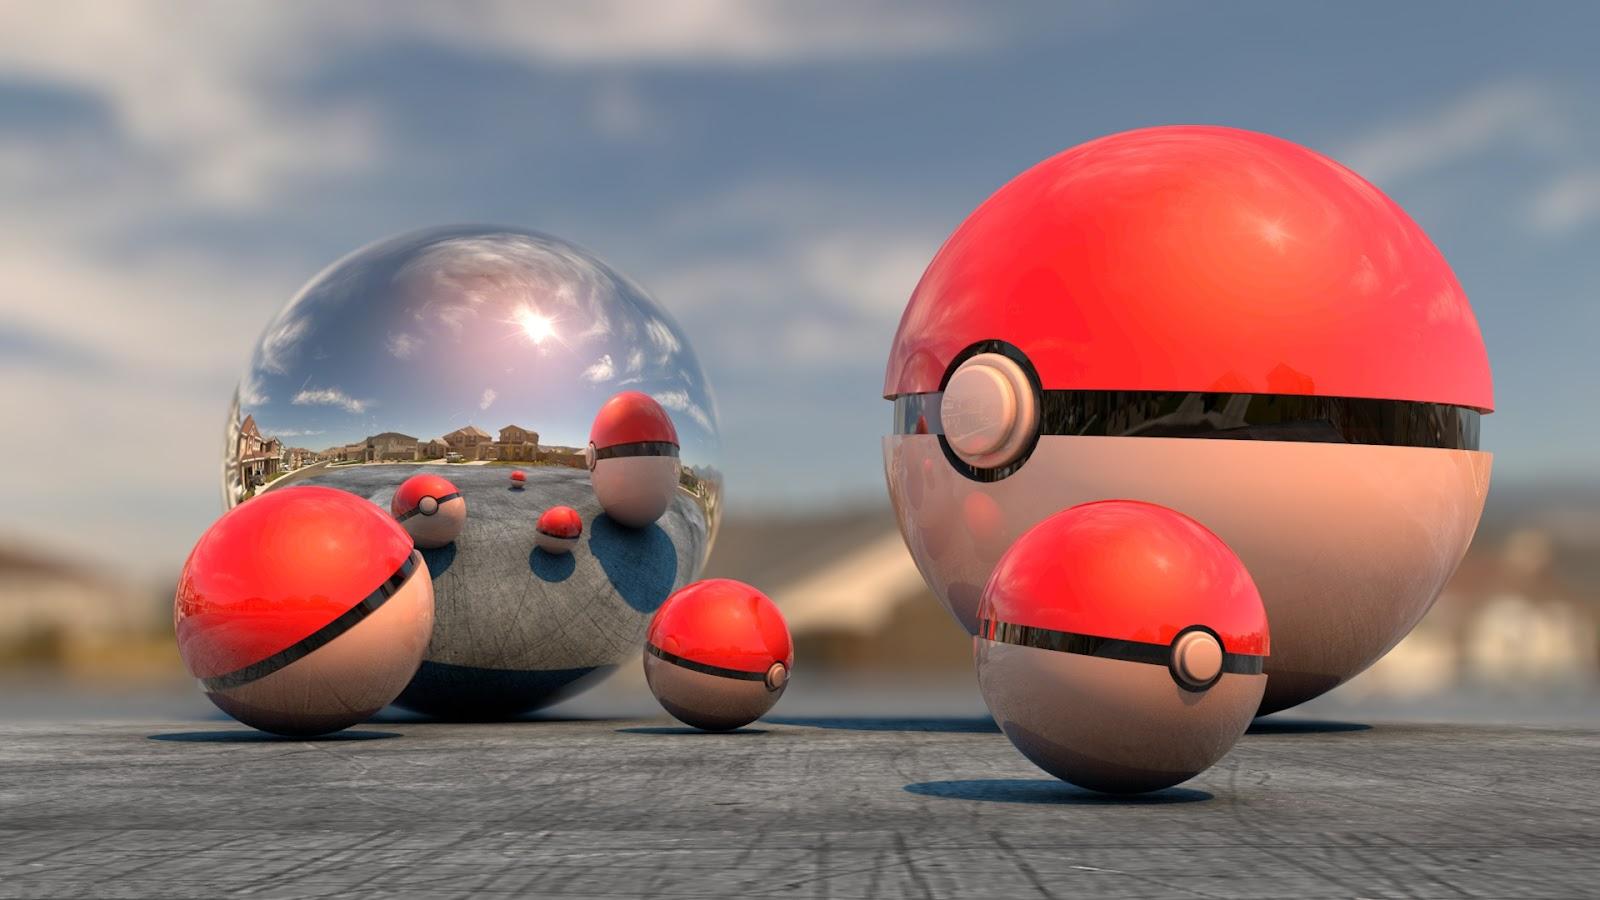 http://1.bp.blogspot.com/-euRKfLzRVEs/UPJdHhI9JgI/AAAAAAAAAM4/s9cxKRpbb2s/s1600/pink-red-balls-shadow-in-mirror-ball-with-sky-background-cartoon-hd-wallpapers-1920-x-1080.jpg